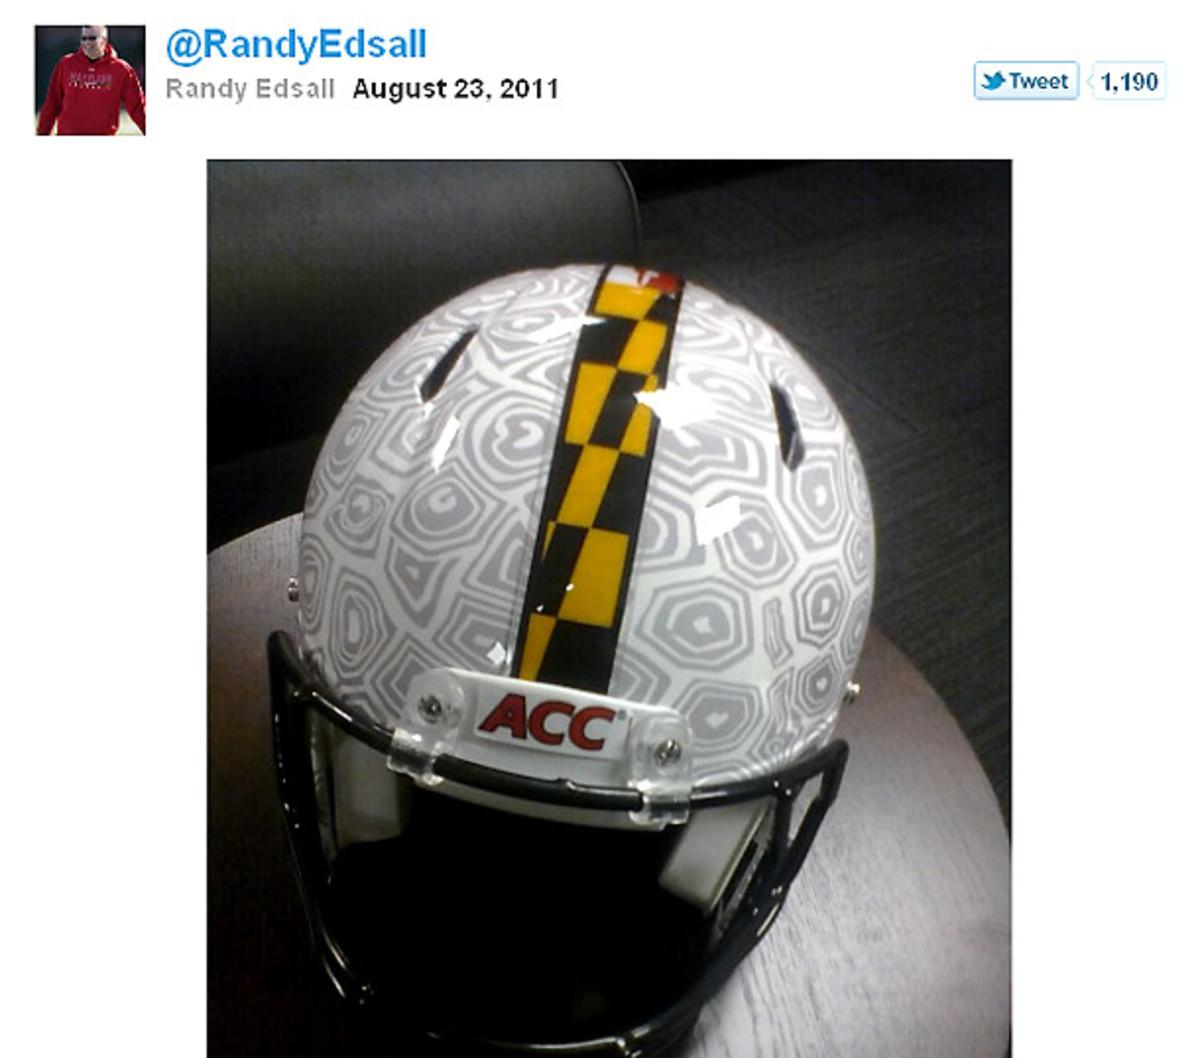 edsall-helmet-tweet